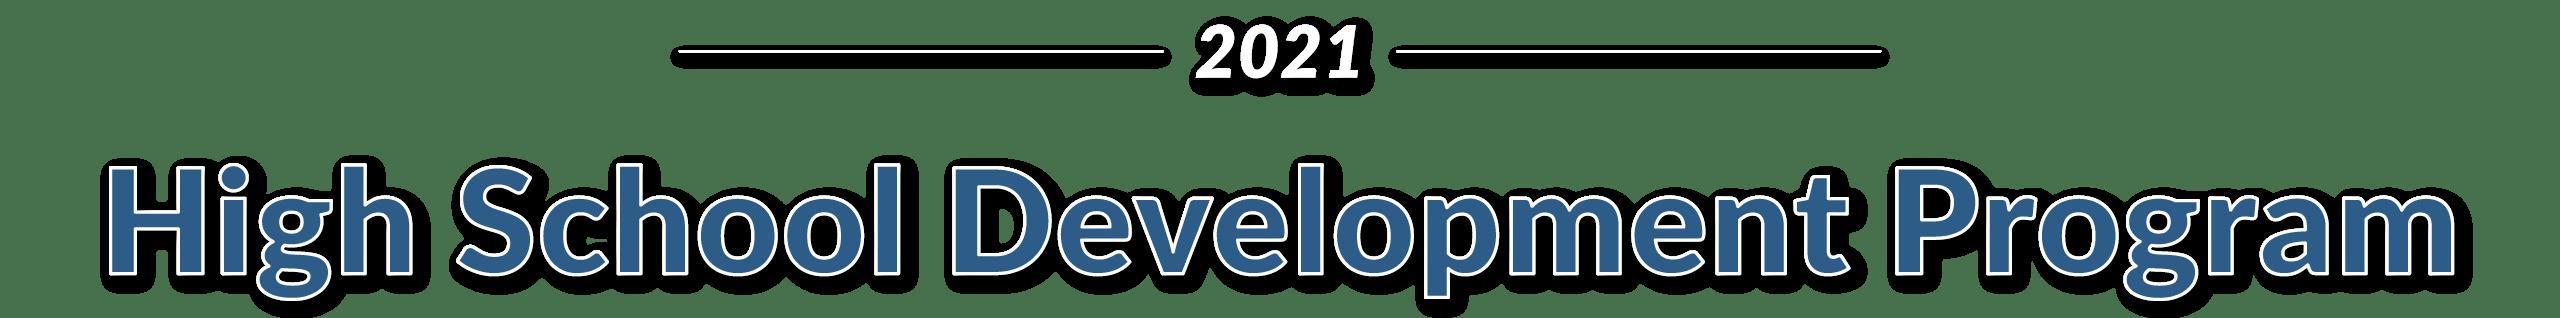 High School Development Program